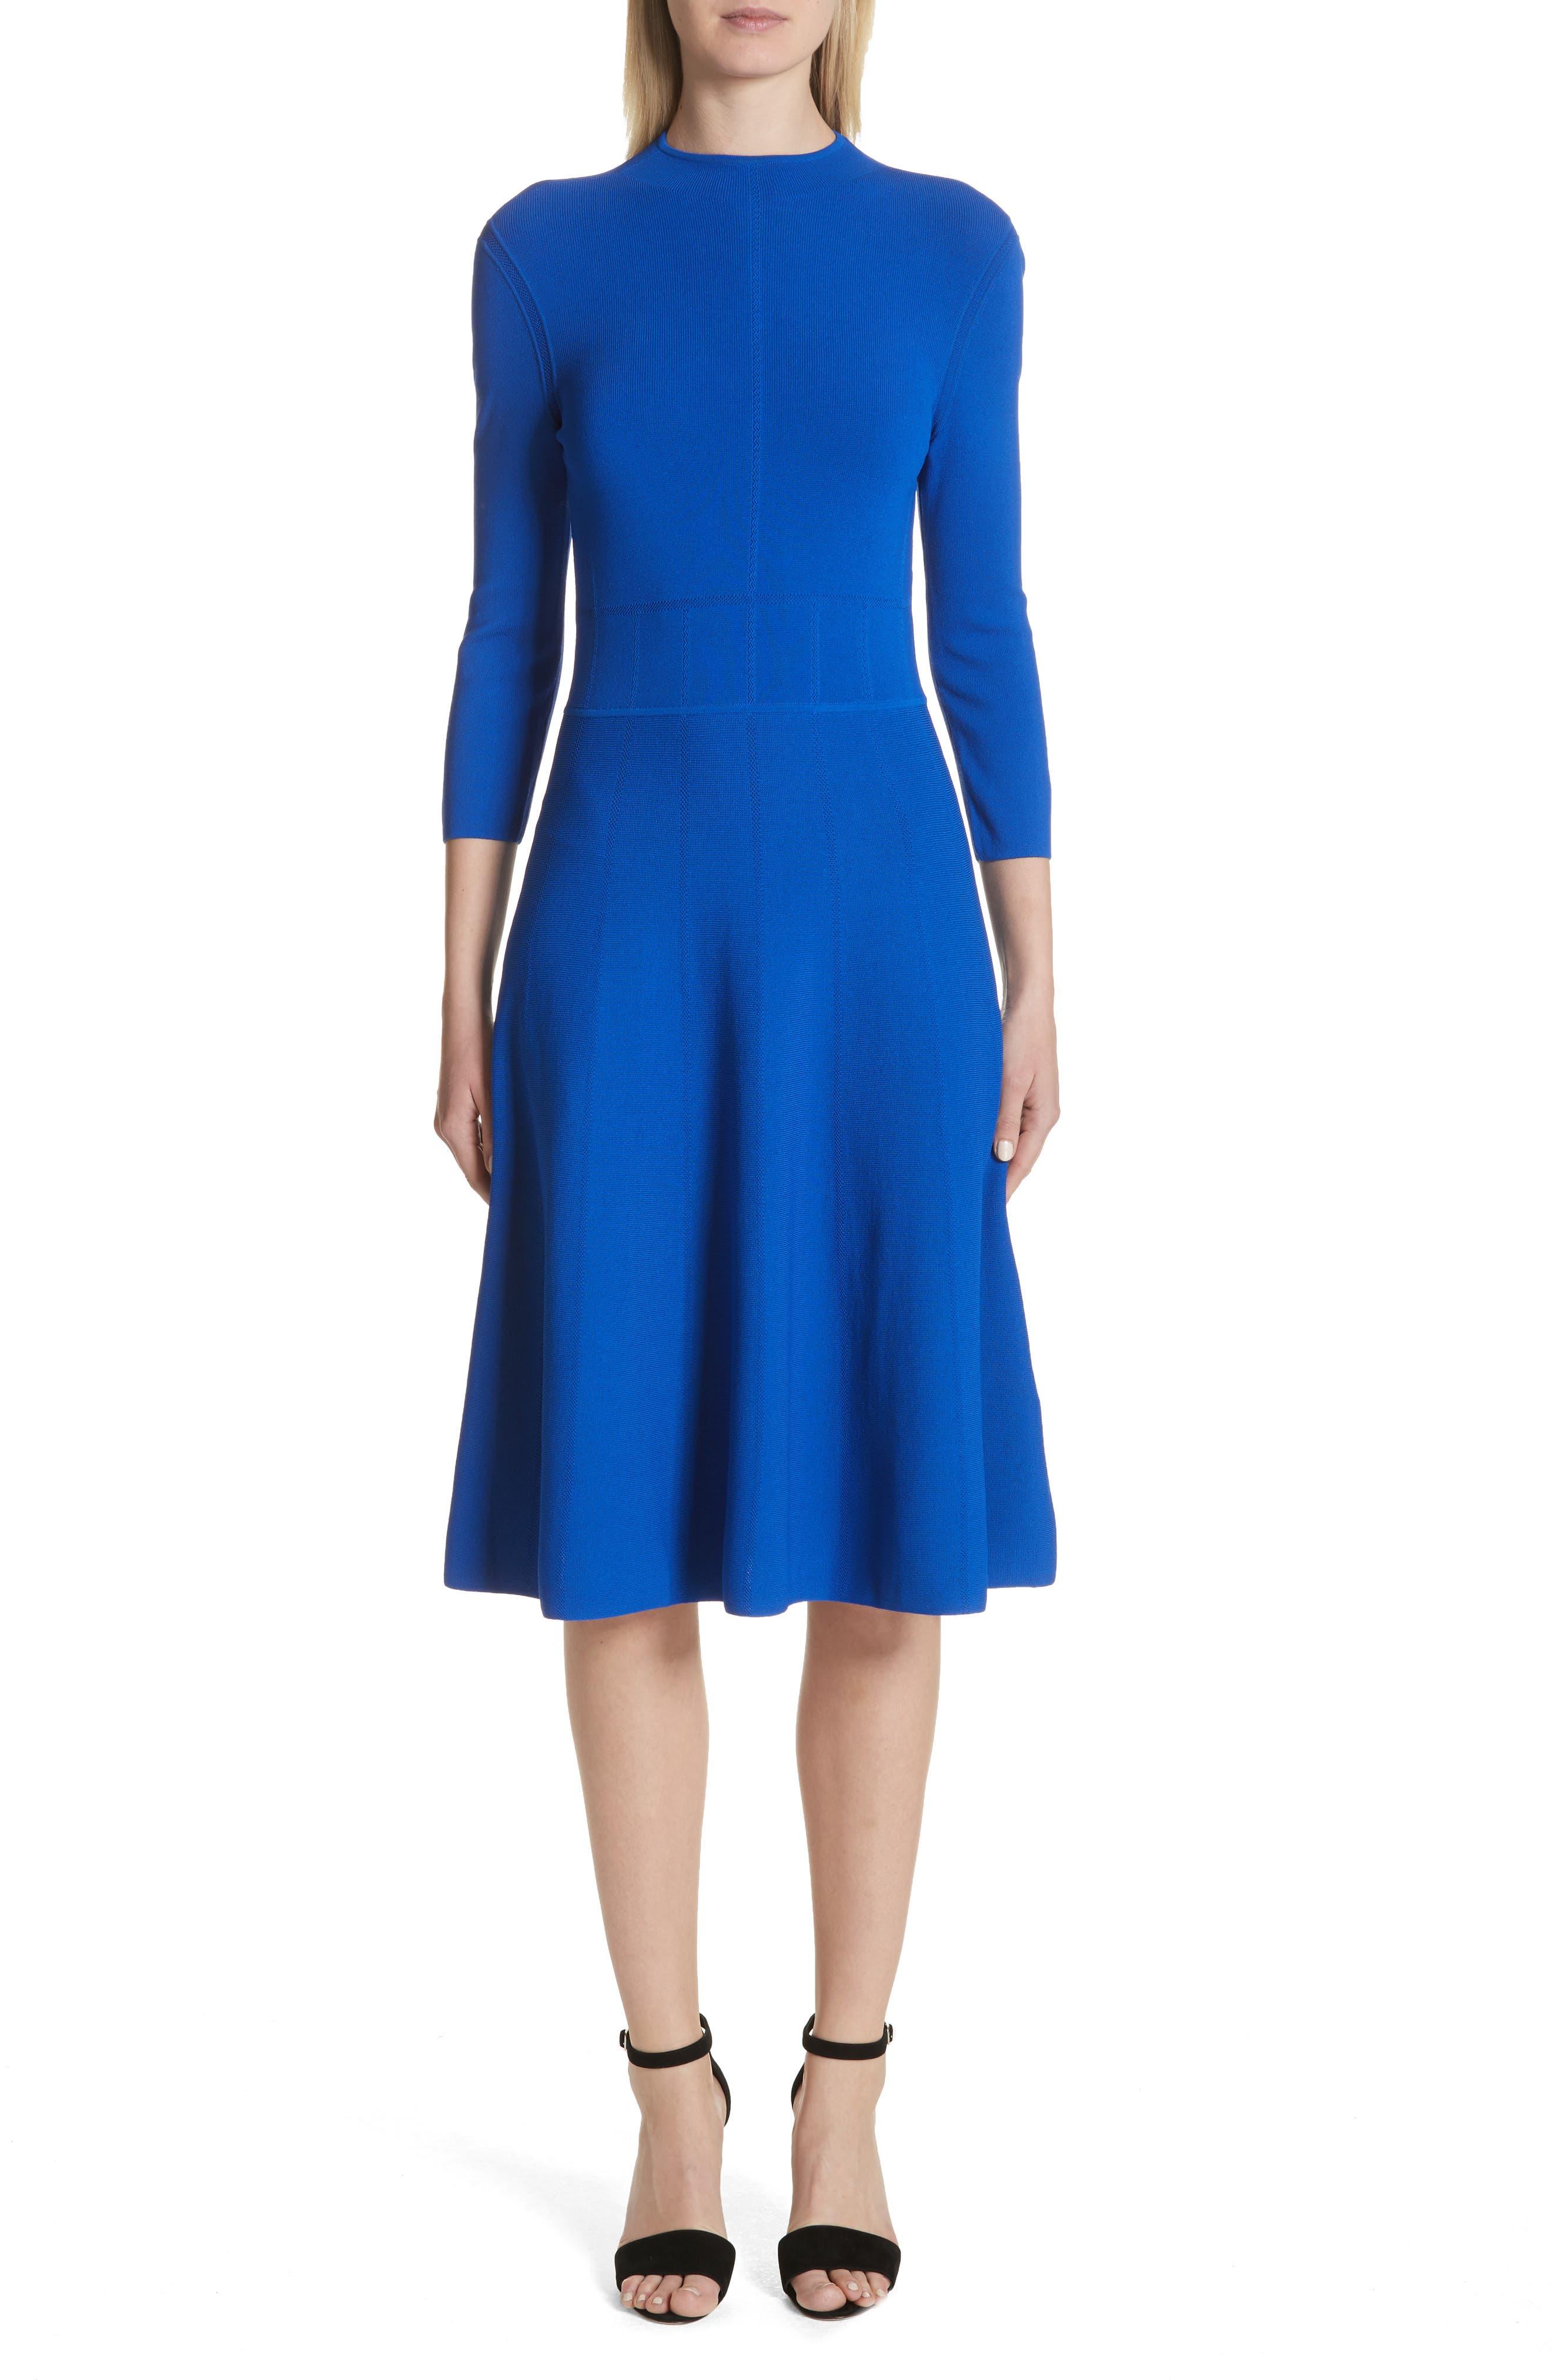 Main Image - Emporio Armani High Neck Fit & Flare Dress